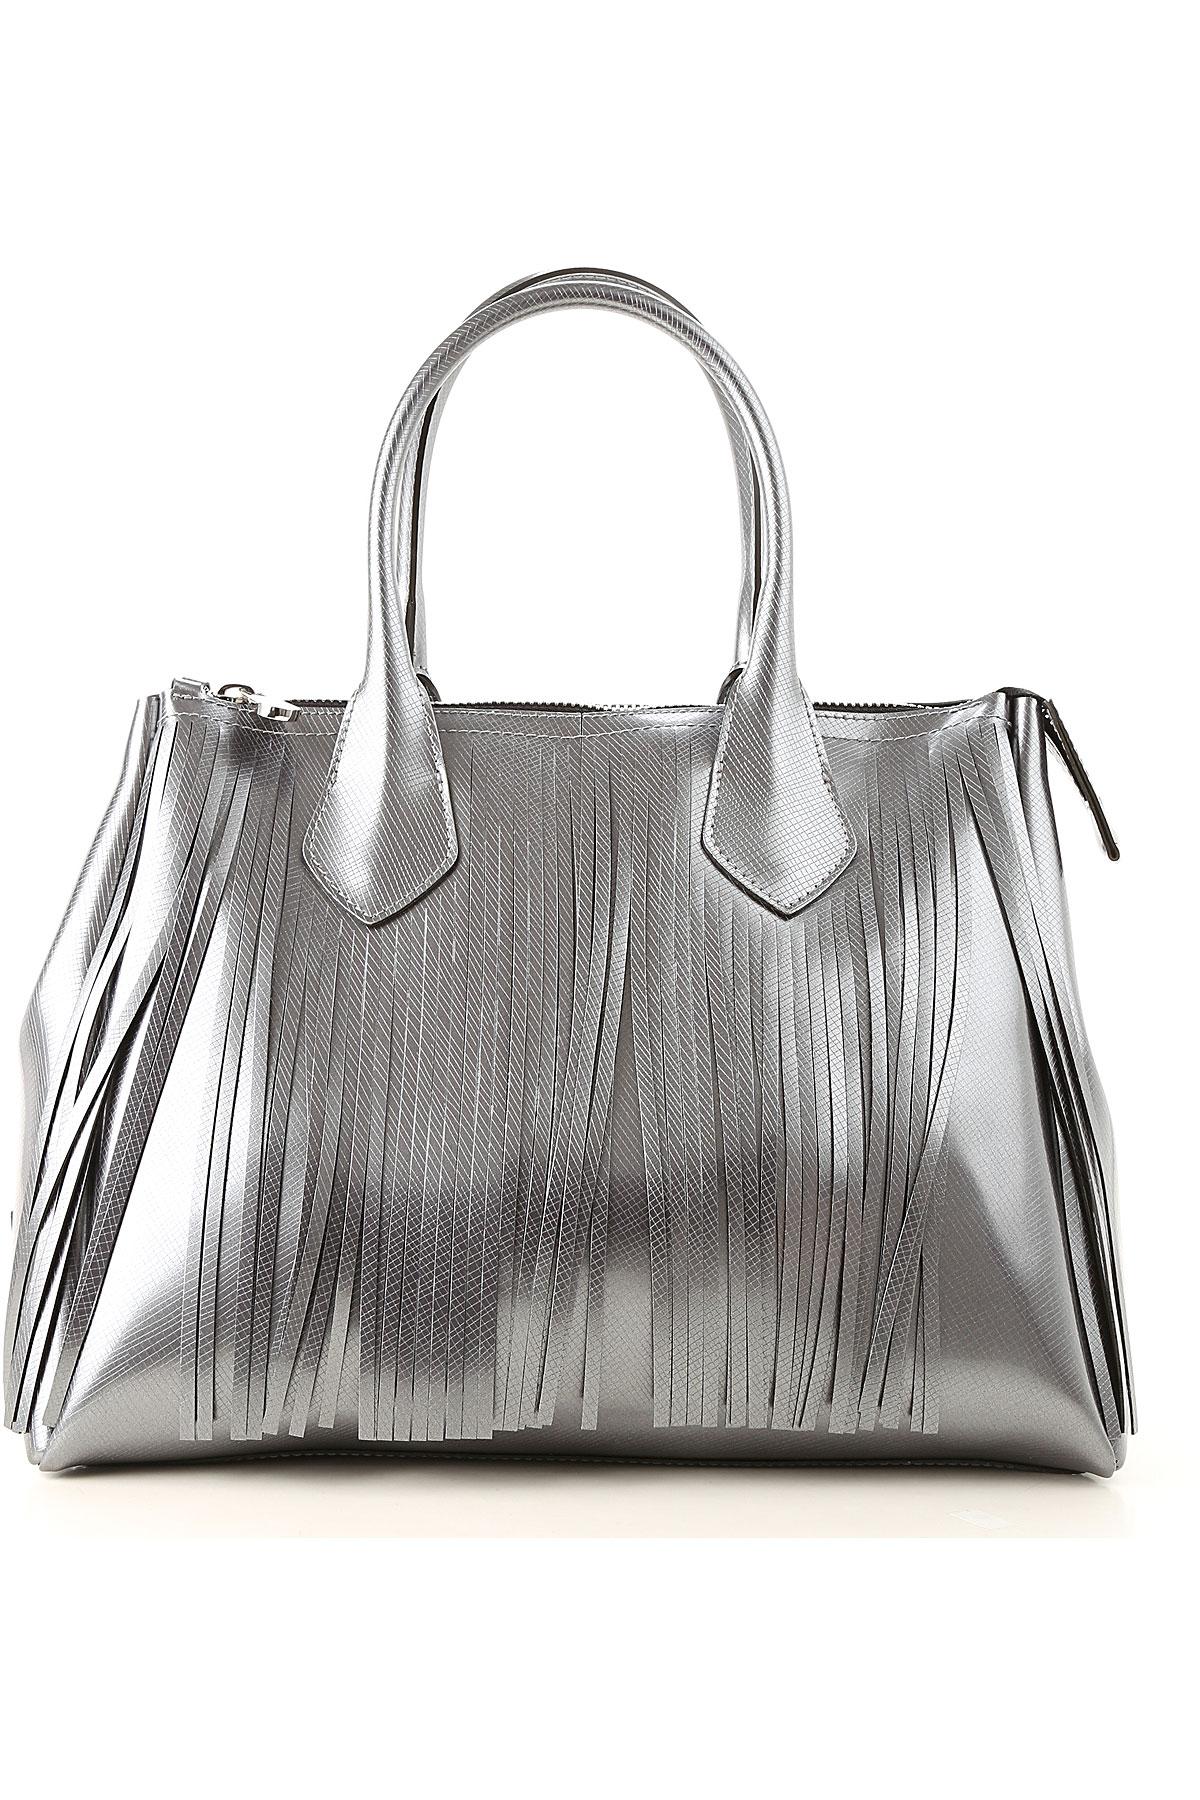 Image of GUM Gianni Chiarini Design Top Handle Handbag, Graphite Grey, Coated Canvas, 2017